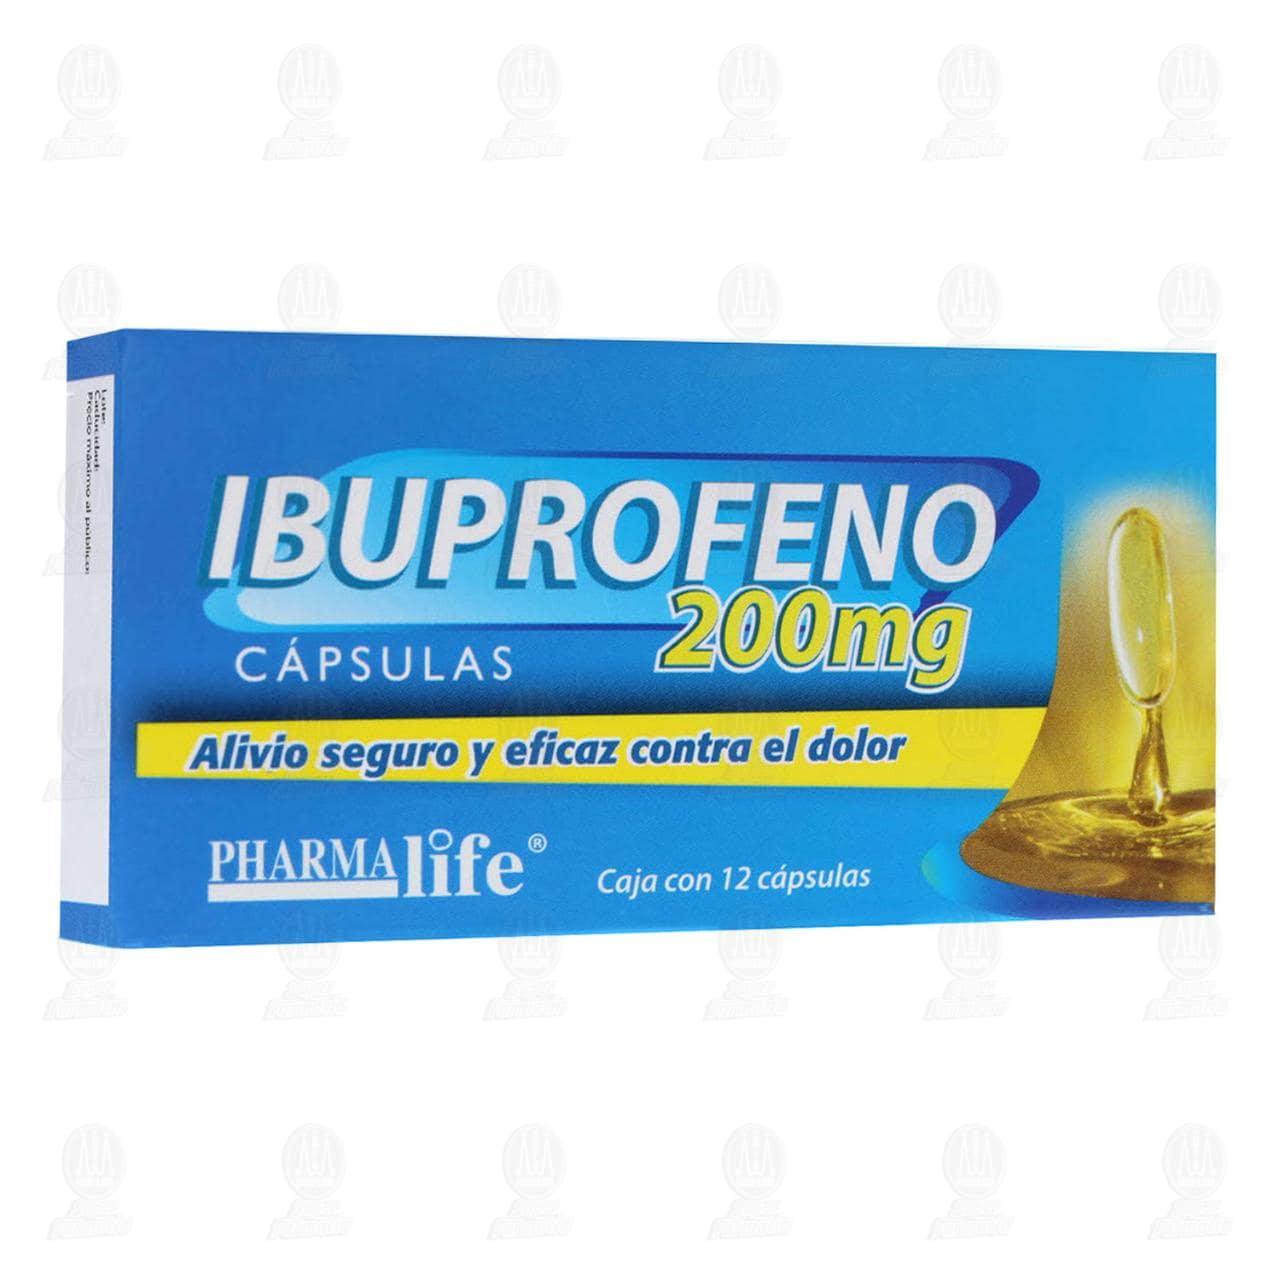 Comprar Ibuprofeno 200mg 12 Cápsulas Pharmalife en Farmacias Guadalajara